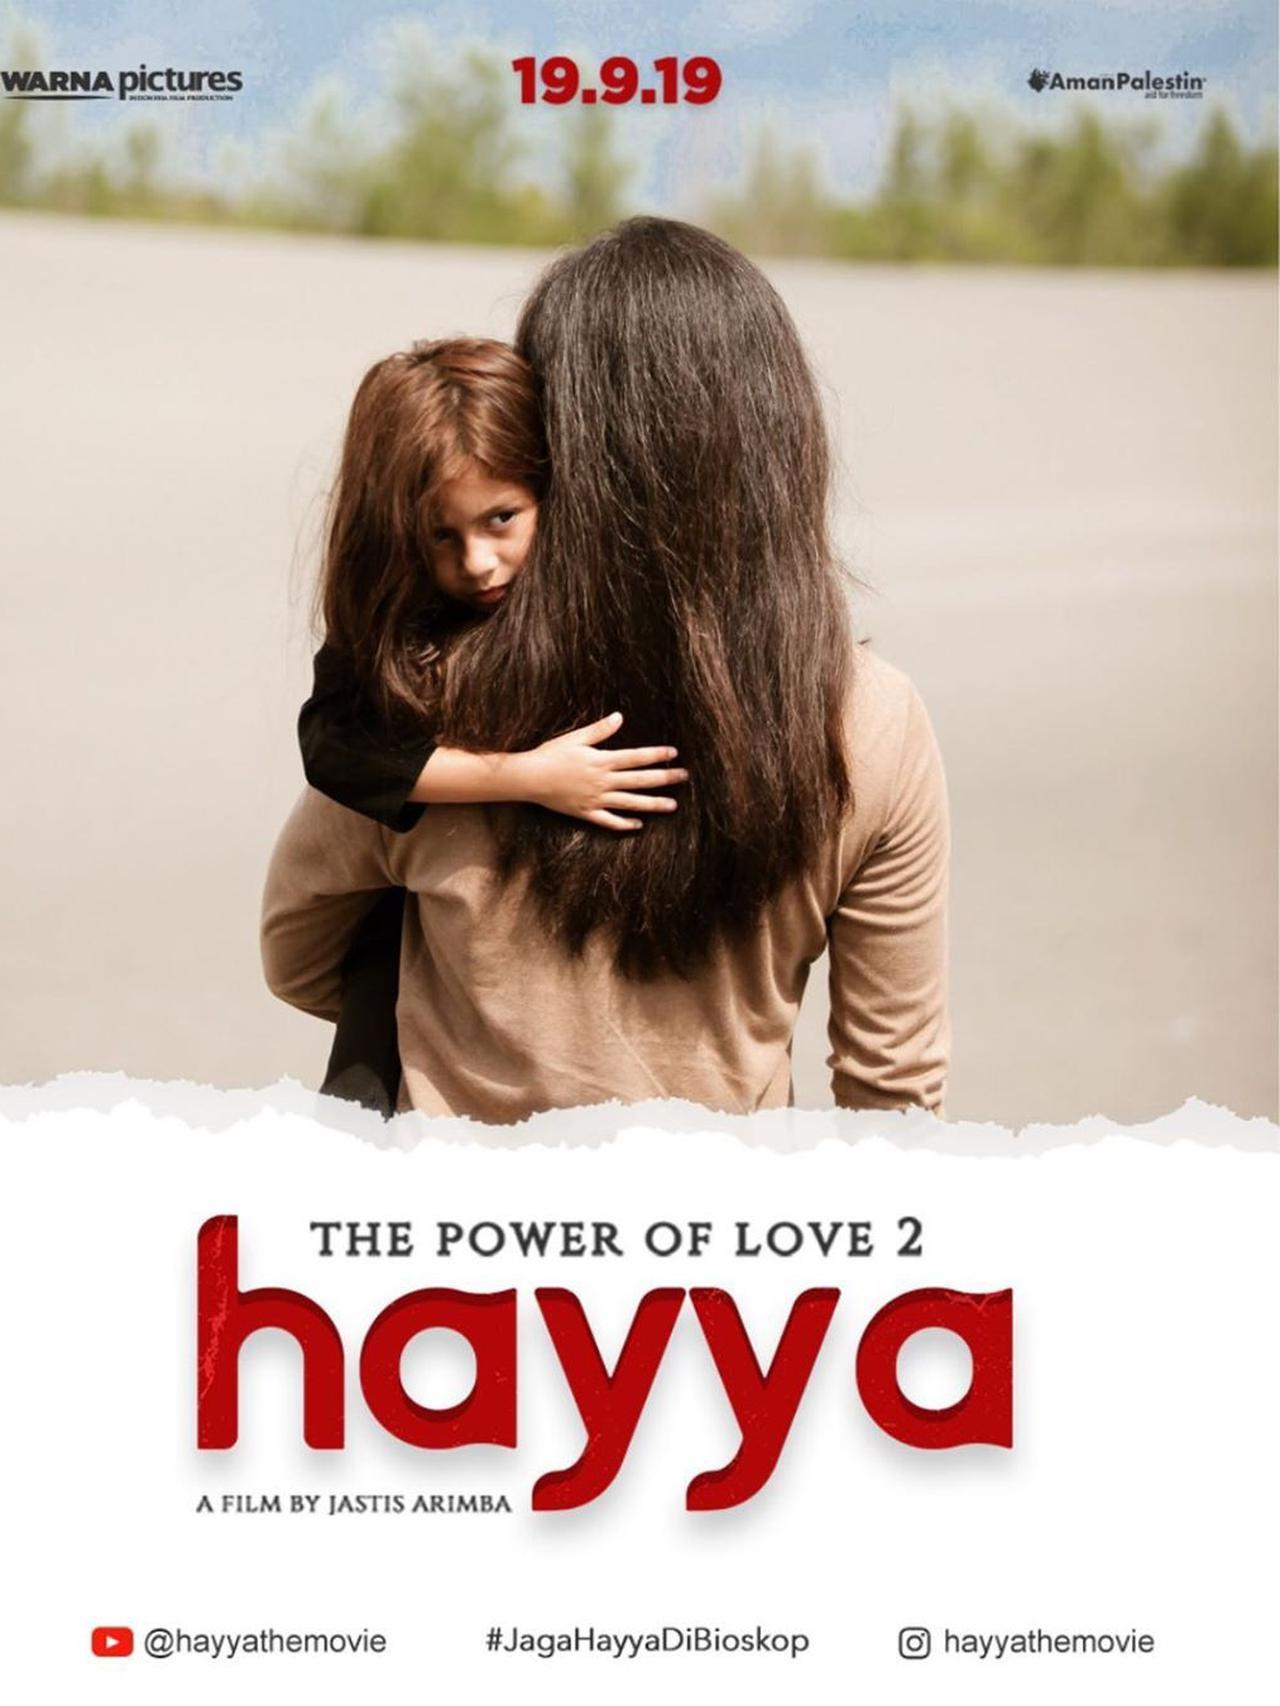 Hayya: The Power of Love 2 3